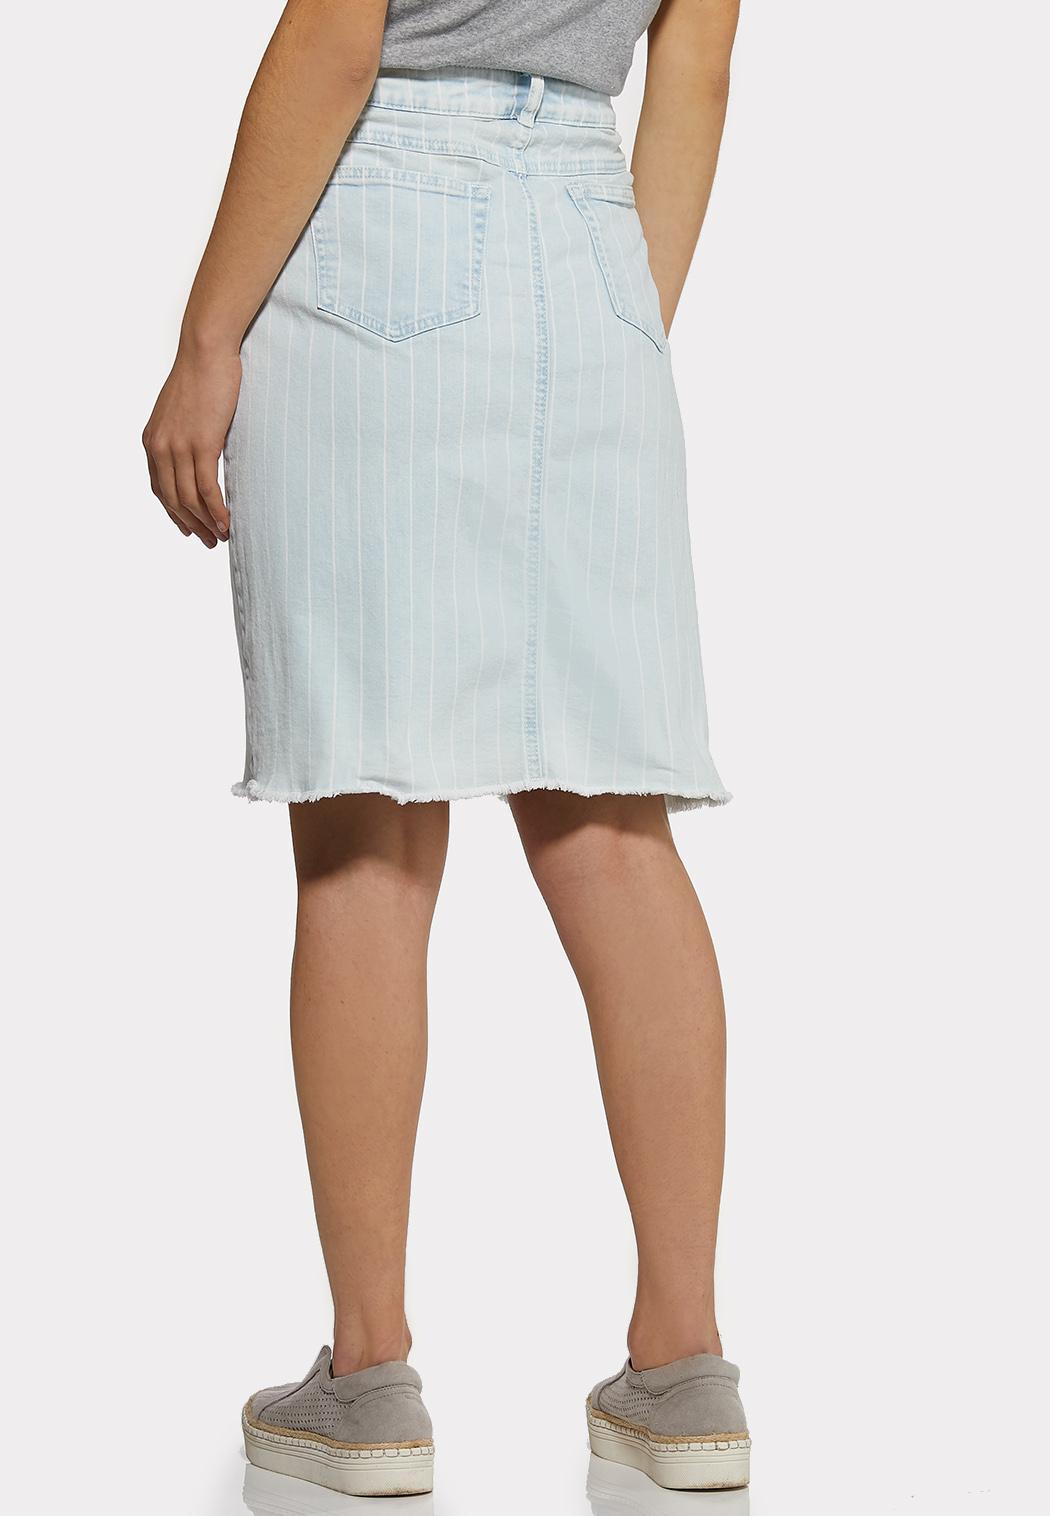 Striped Light Wash Denim Skirt (Item #44203920)